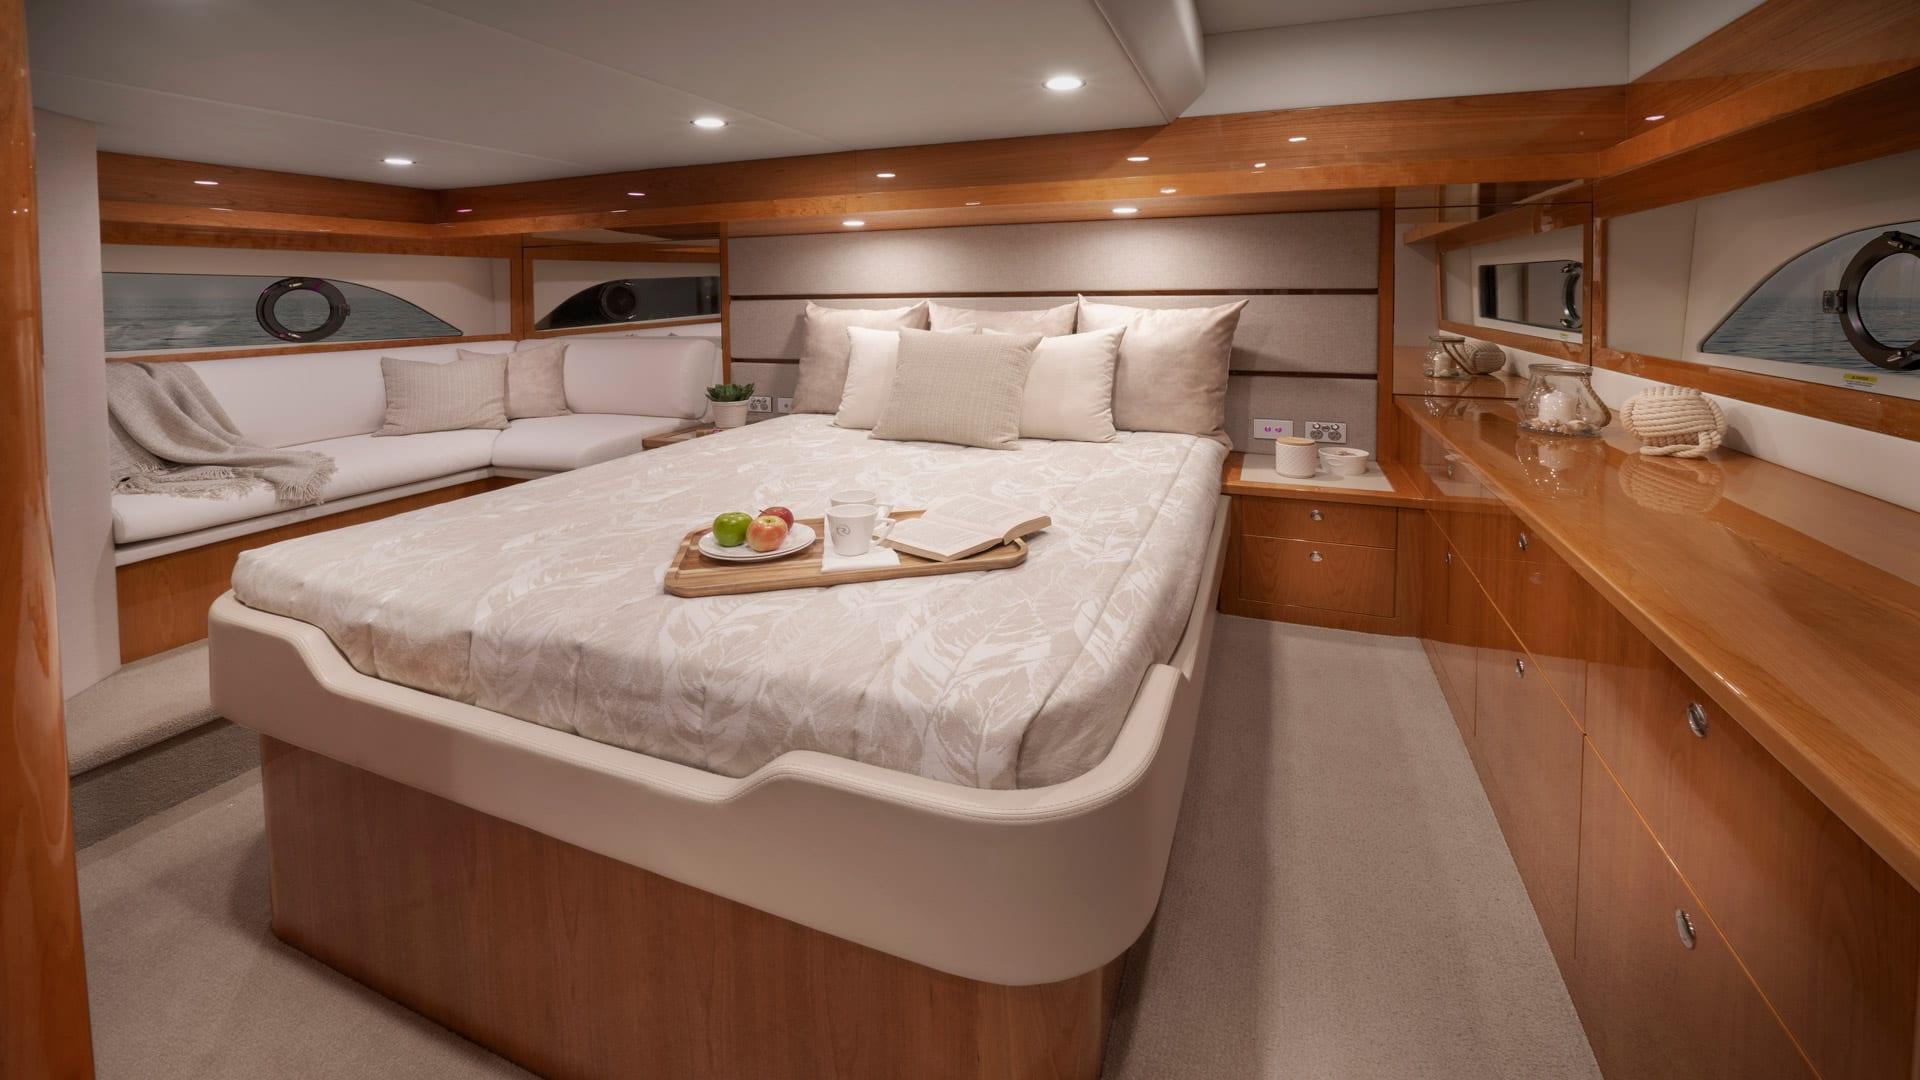 Riviera 54 Enclosed Fybridge Master Stateroom – Gloss Cherrywood Timber Finish 01